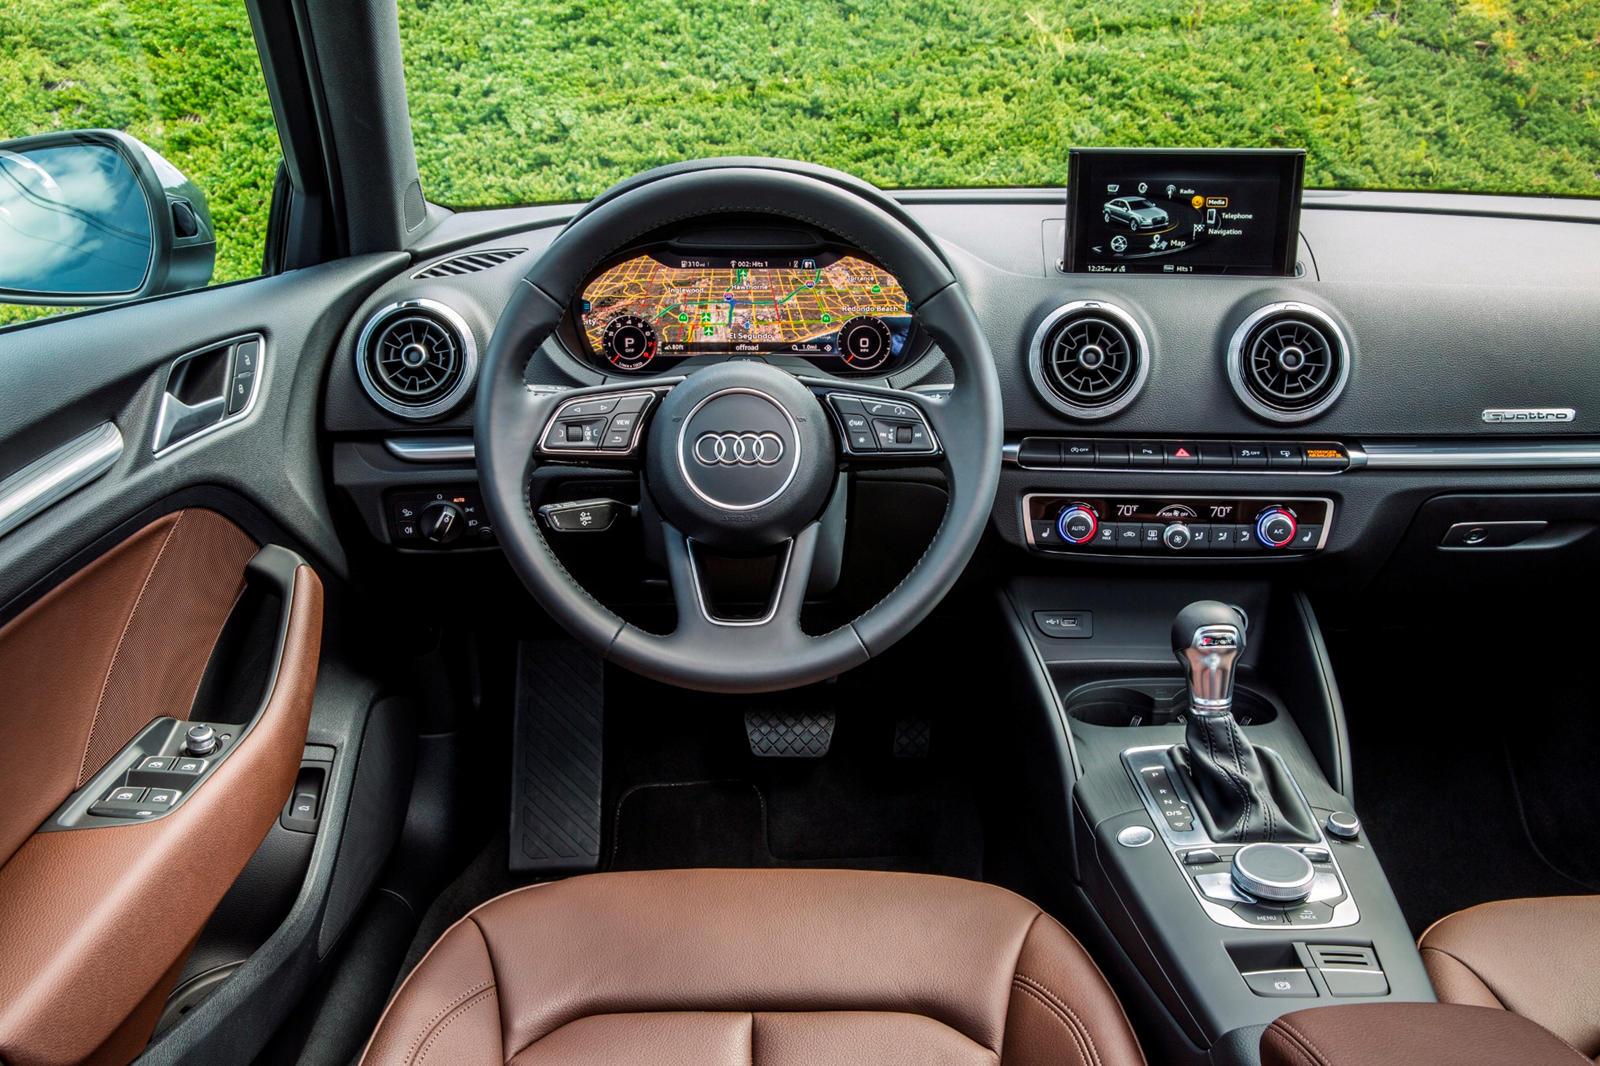 صور سيارة أودي A3 الجديدة 2017-2020-audi-a3-sedan-steering-wheel-controls-carbuzz-359631-1600